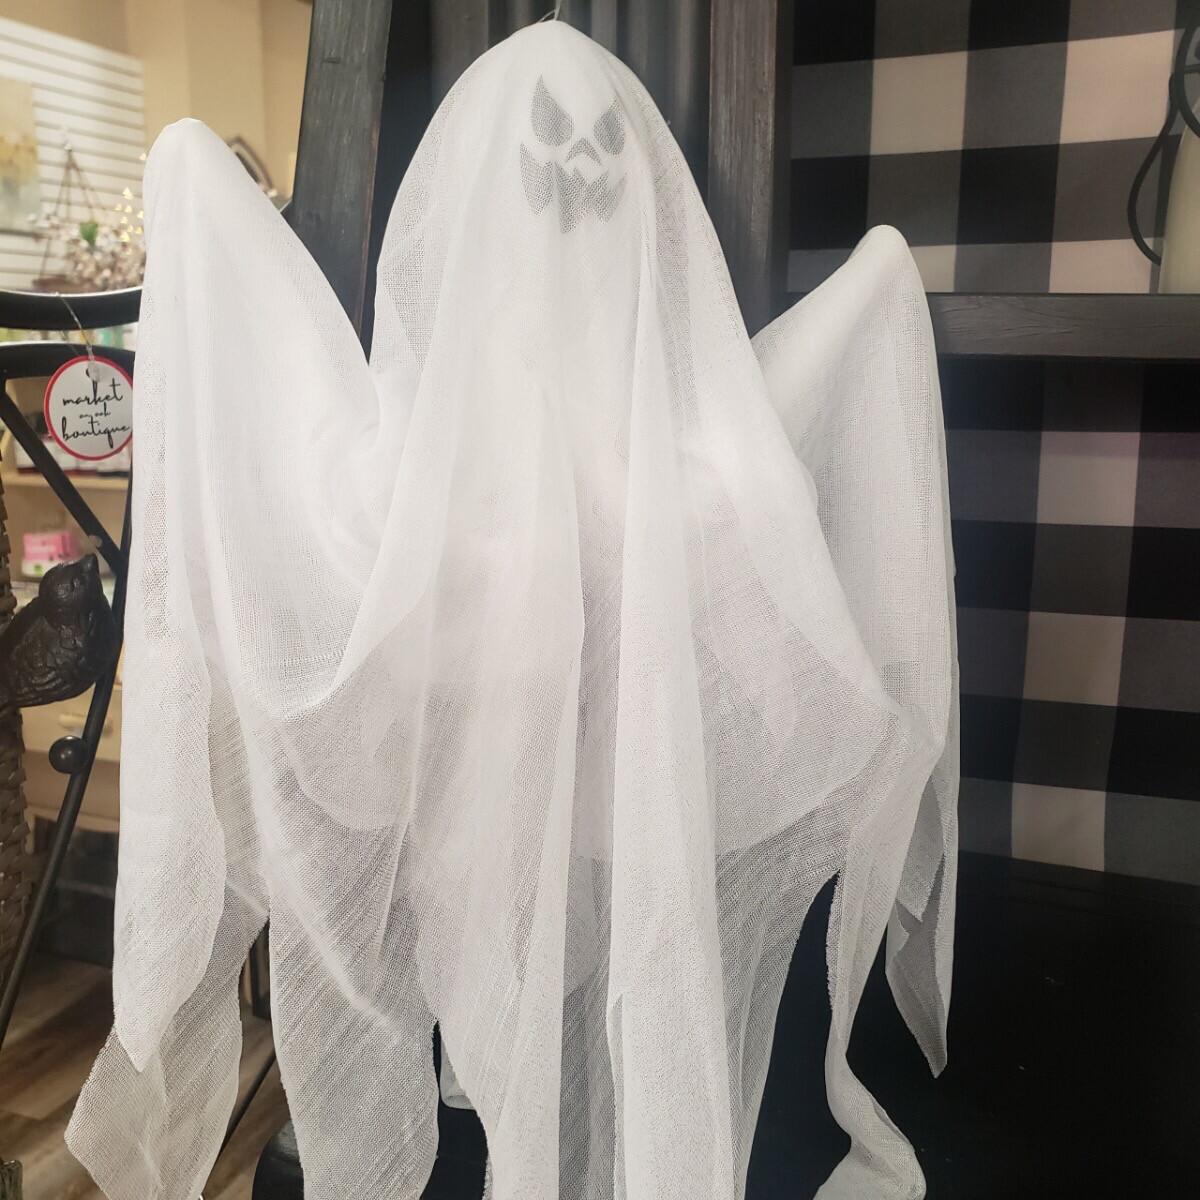 Hanging Ghost Decor